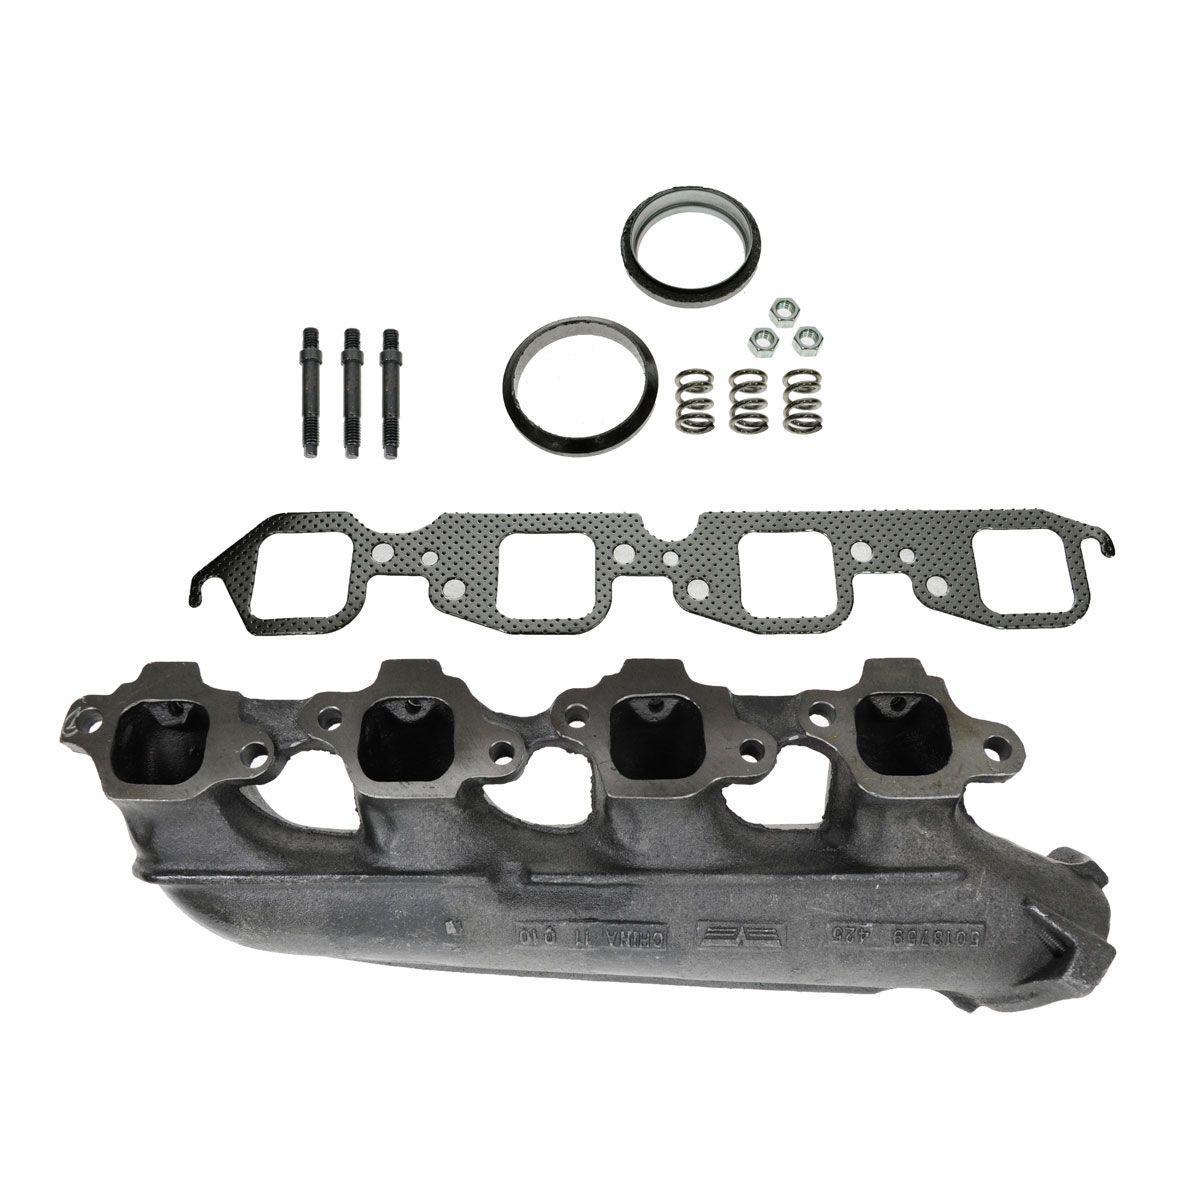 Dorman 674-244 Exhaust Manifold Kit For Chevy GMC Big